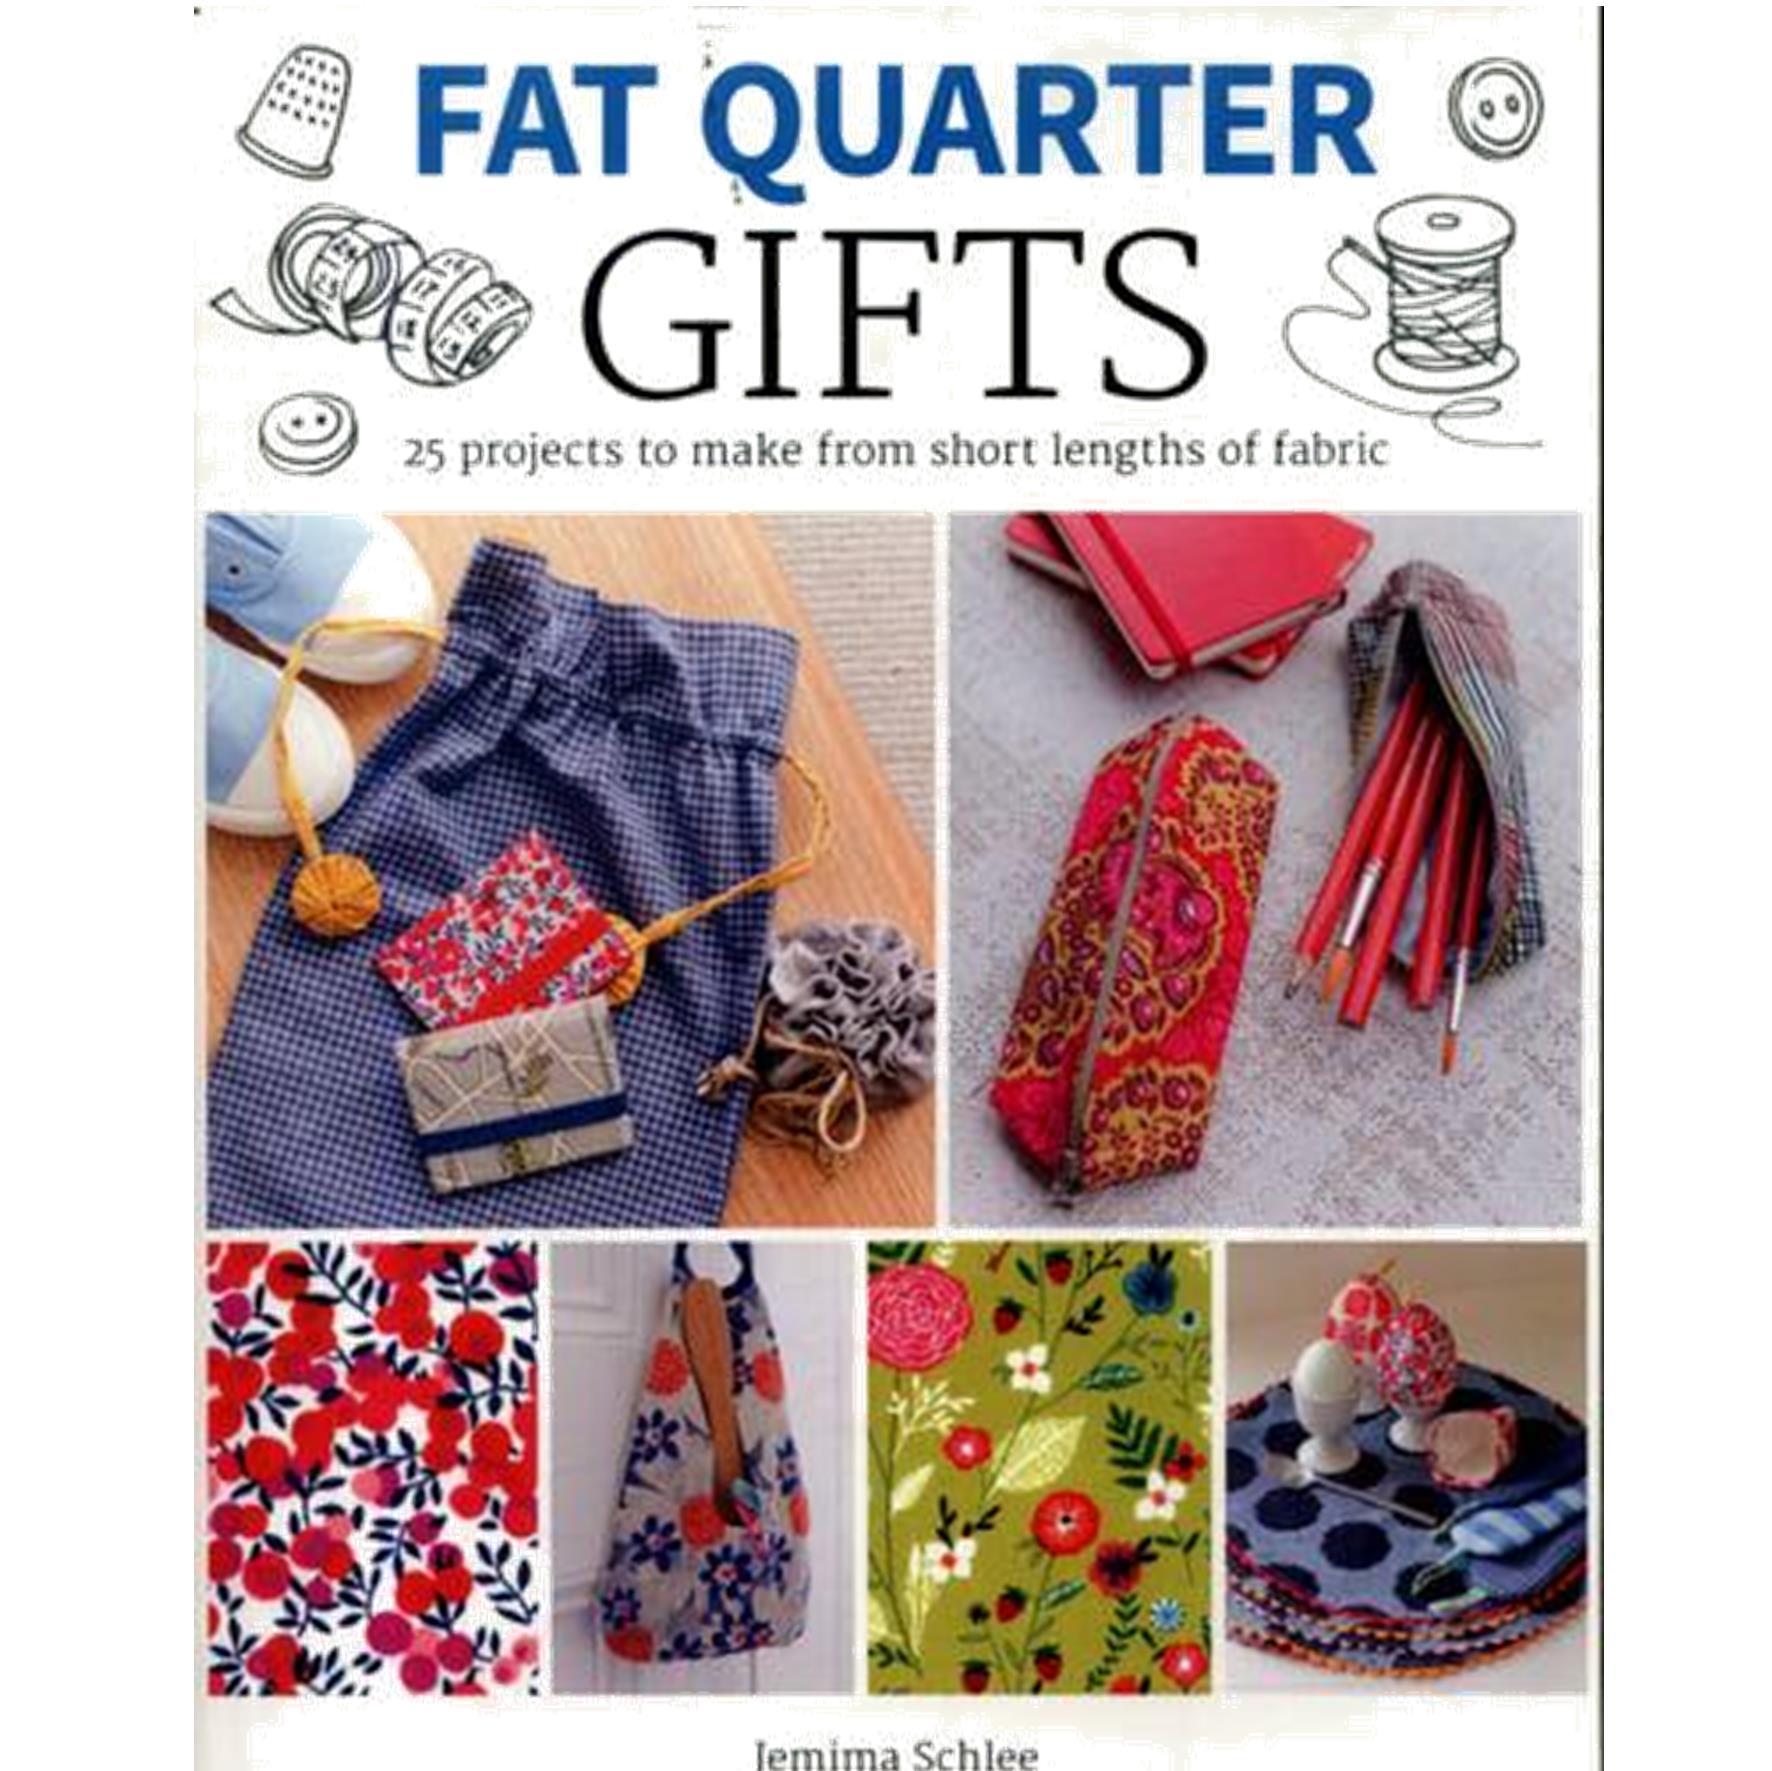 Fat Quarter Gifts – Jemima Schlee